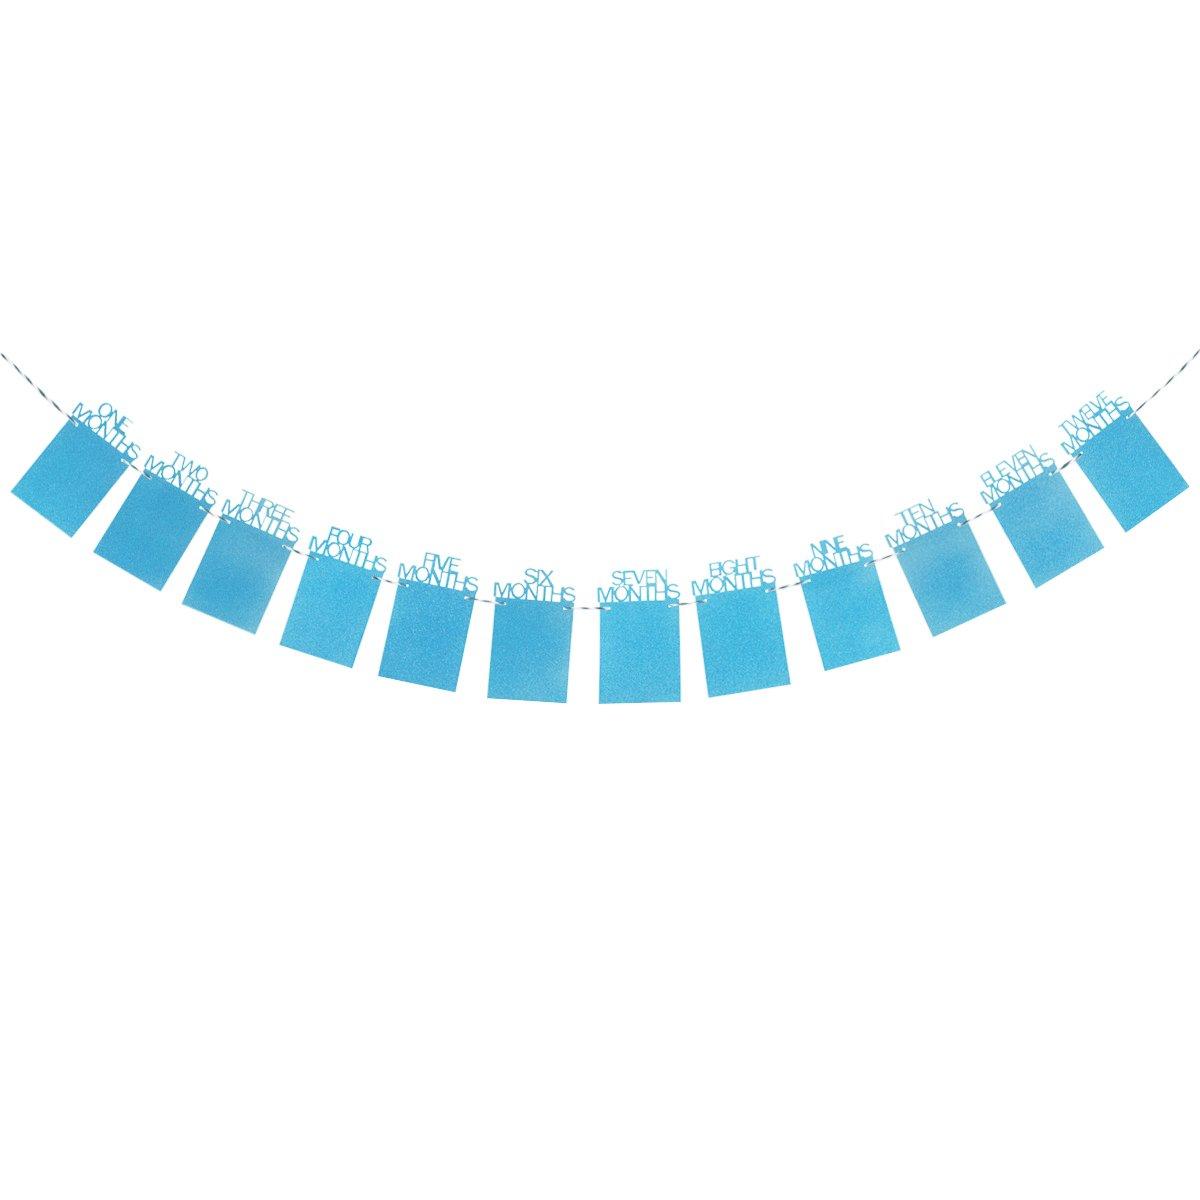 Tinksky赤ちゃん成長記録1 – 12口フォトロープのバナー1st誕生日パーティー装飾用(ブルー)   B075Z7G8QC